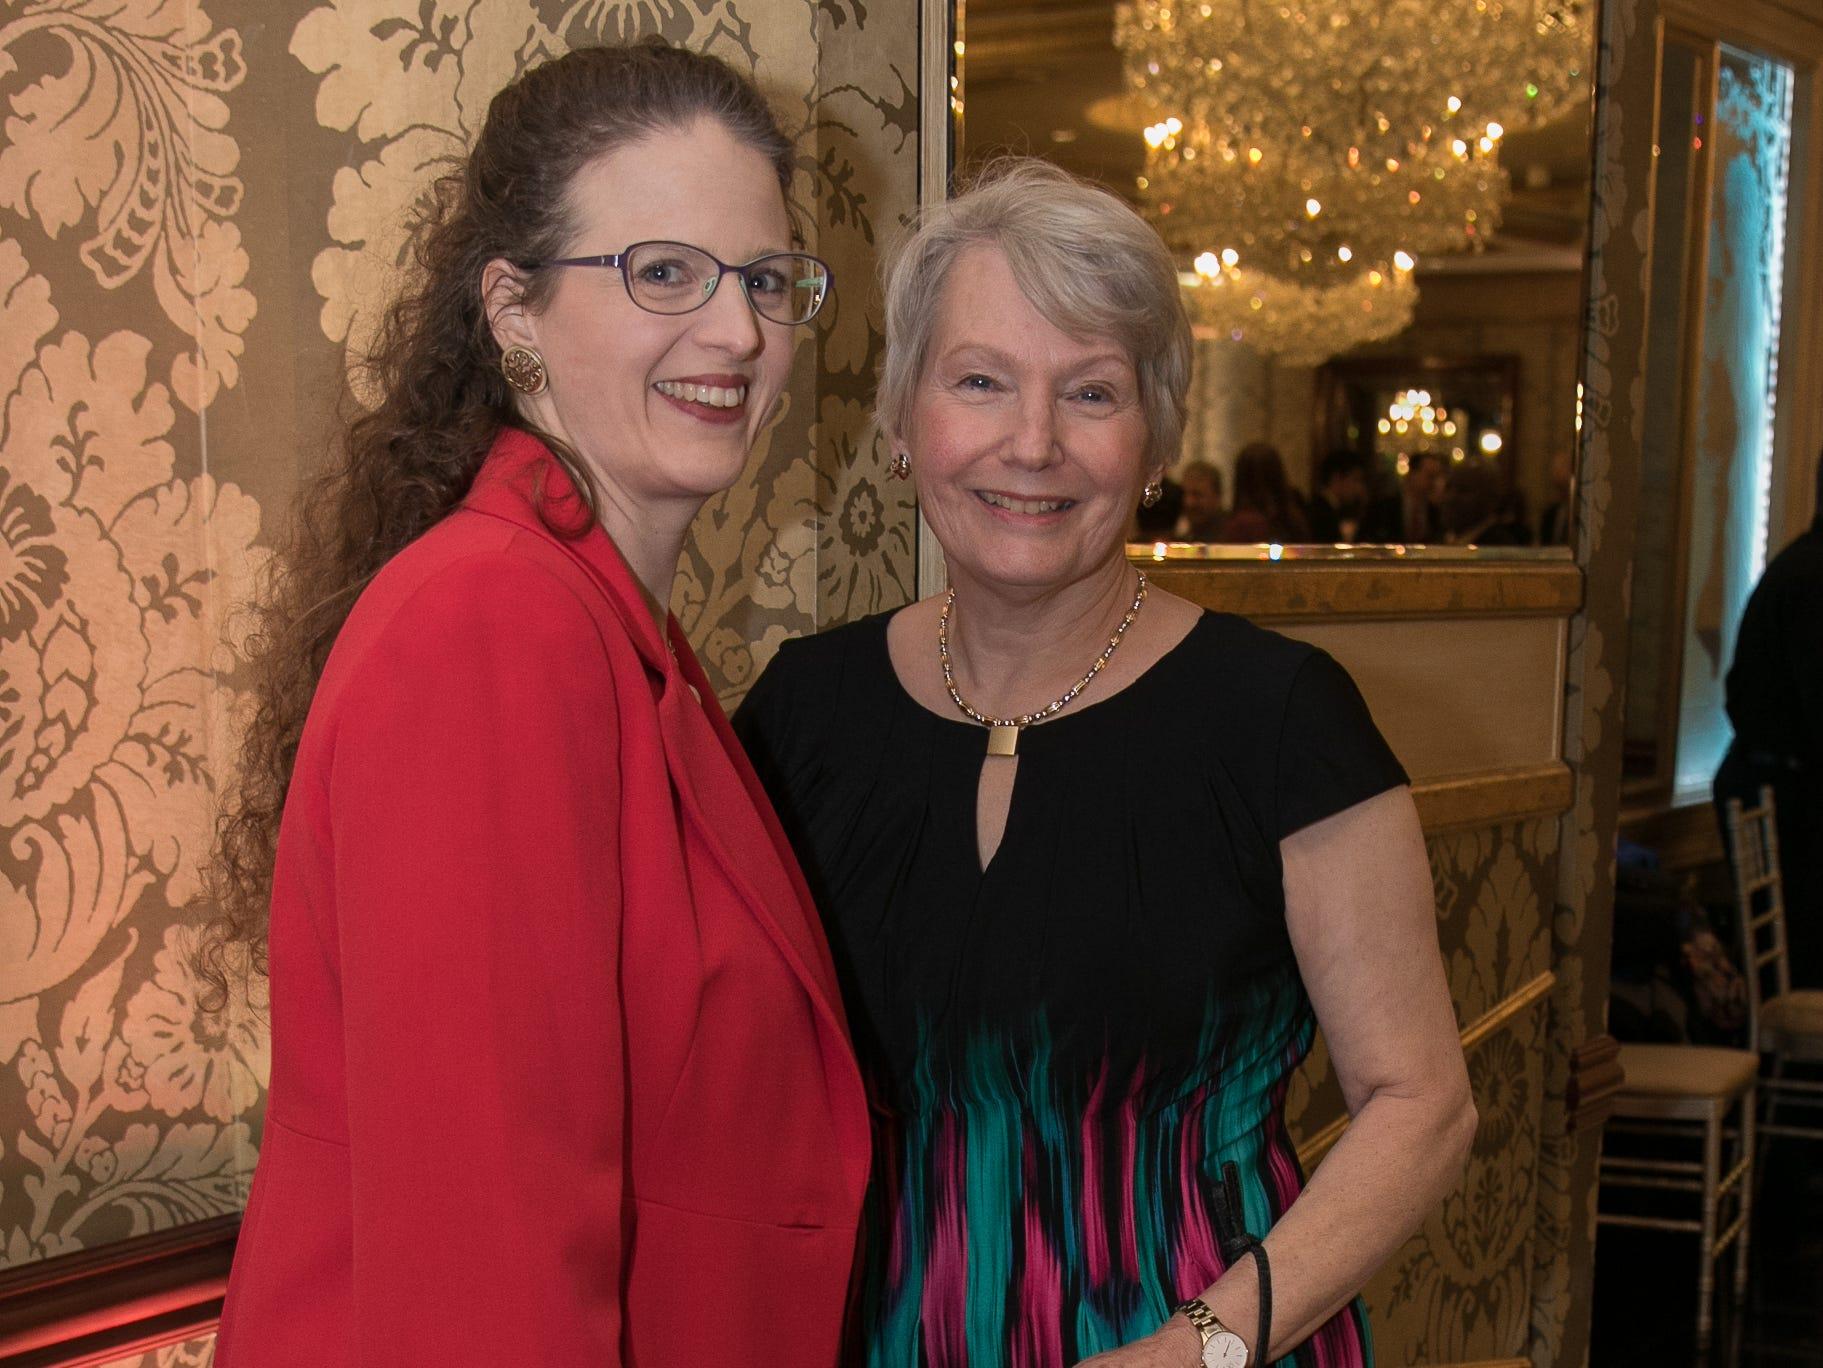 Anastasia Swope, Joan Hickey. Youth Consultation Service – YCS held their 100th Anniversary Celebration at Seasons in Washington Township.11/5/2018